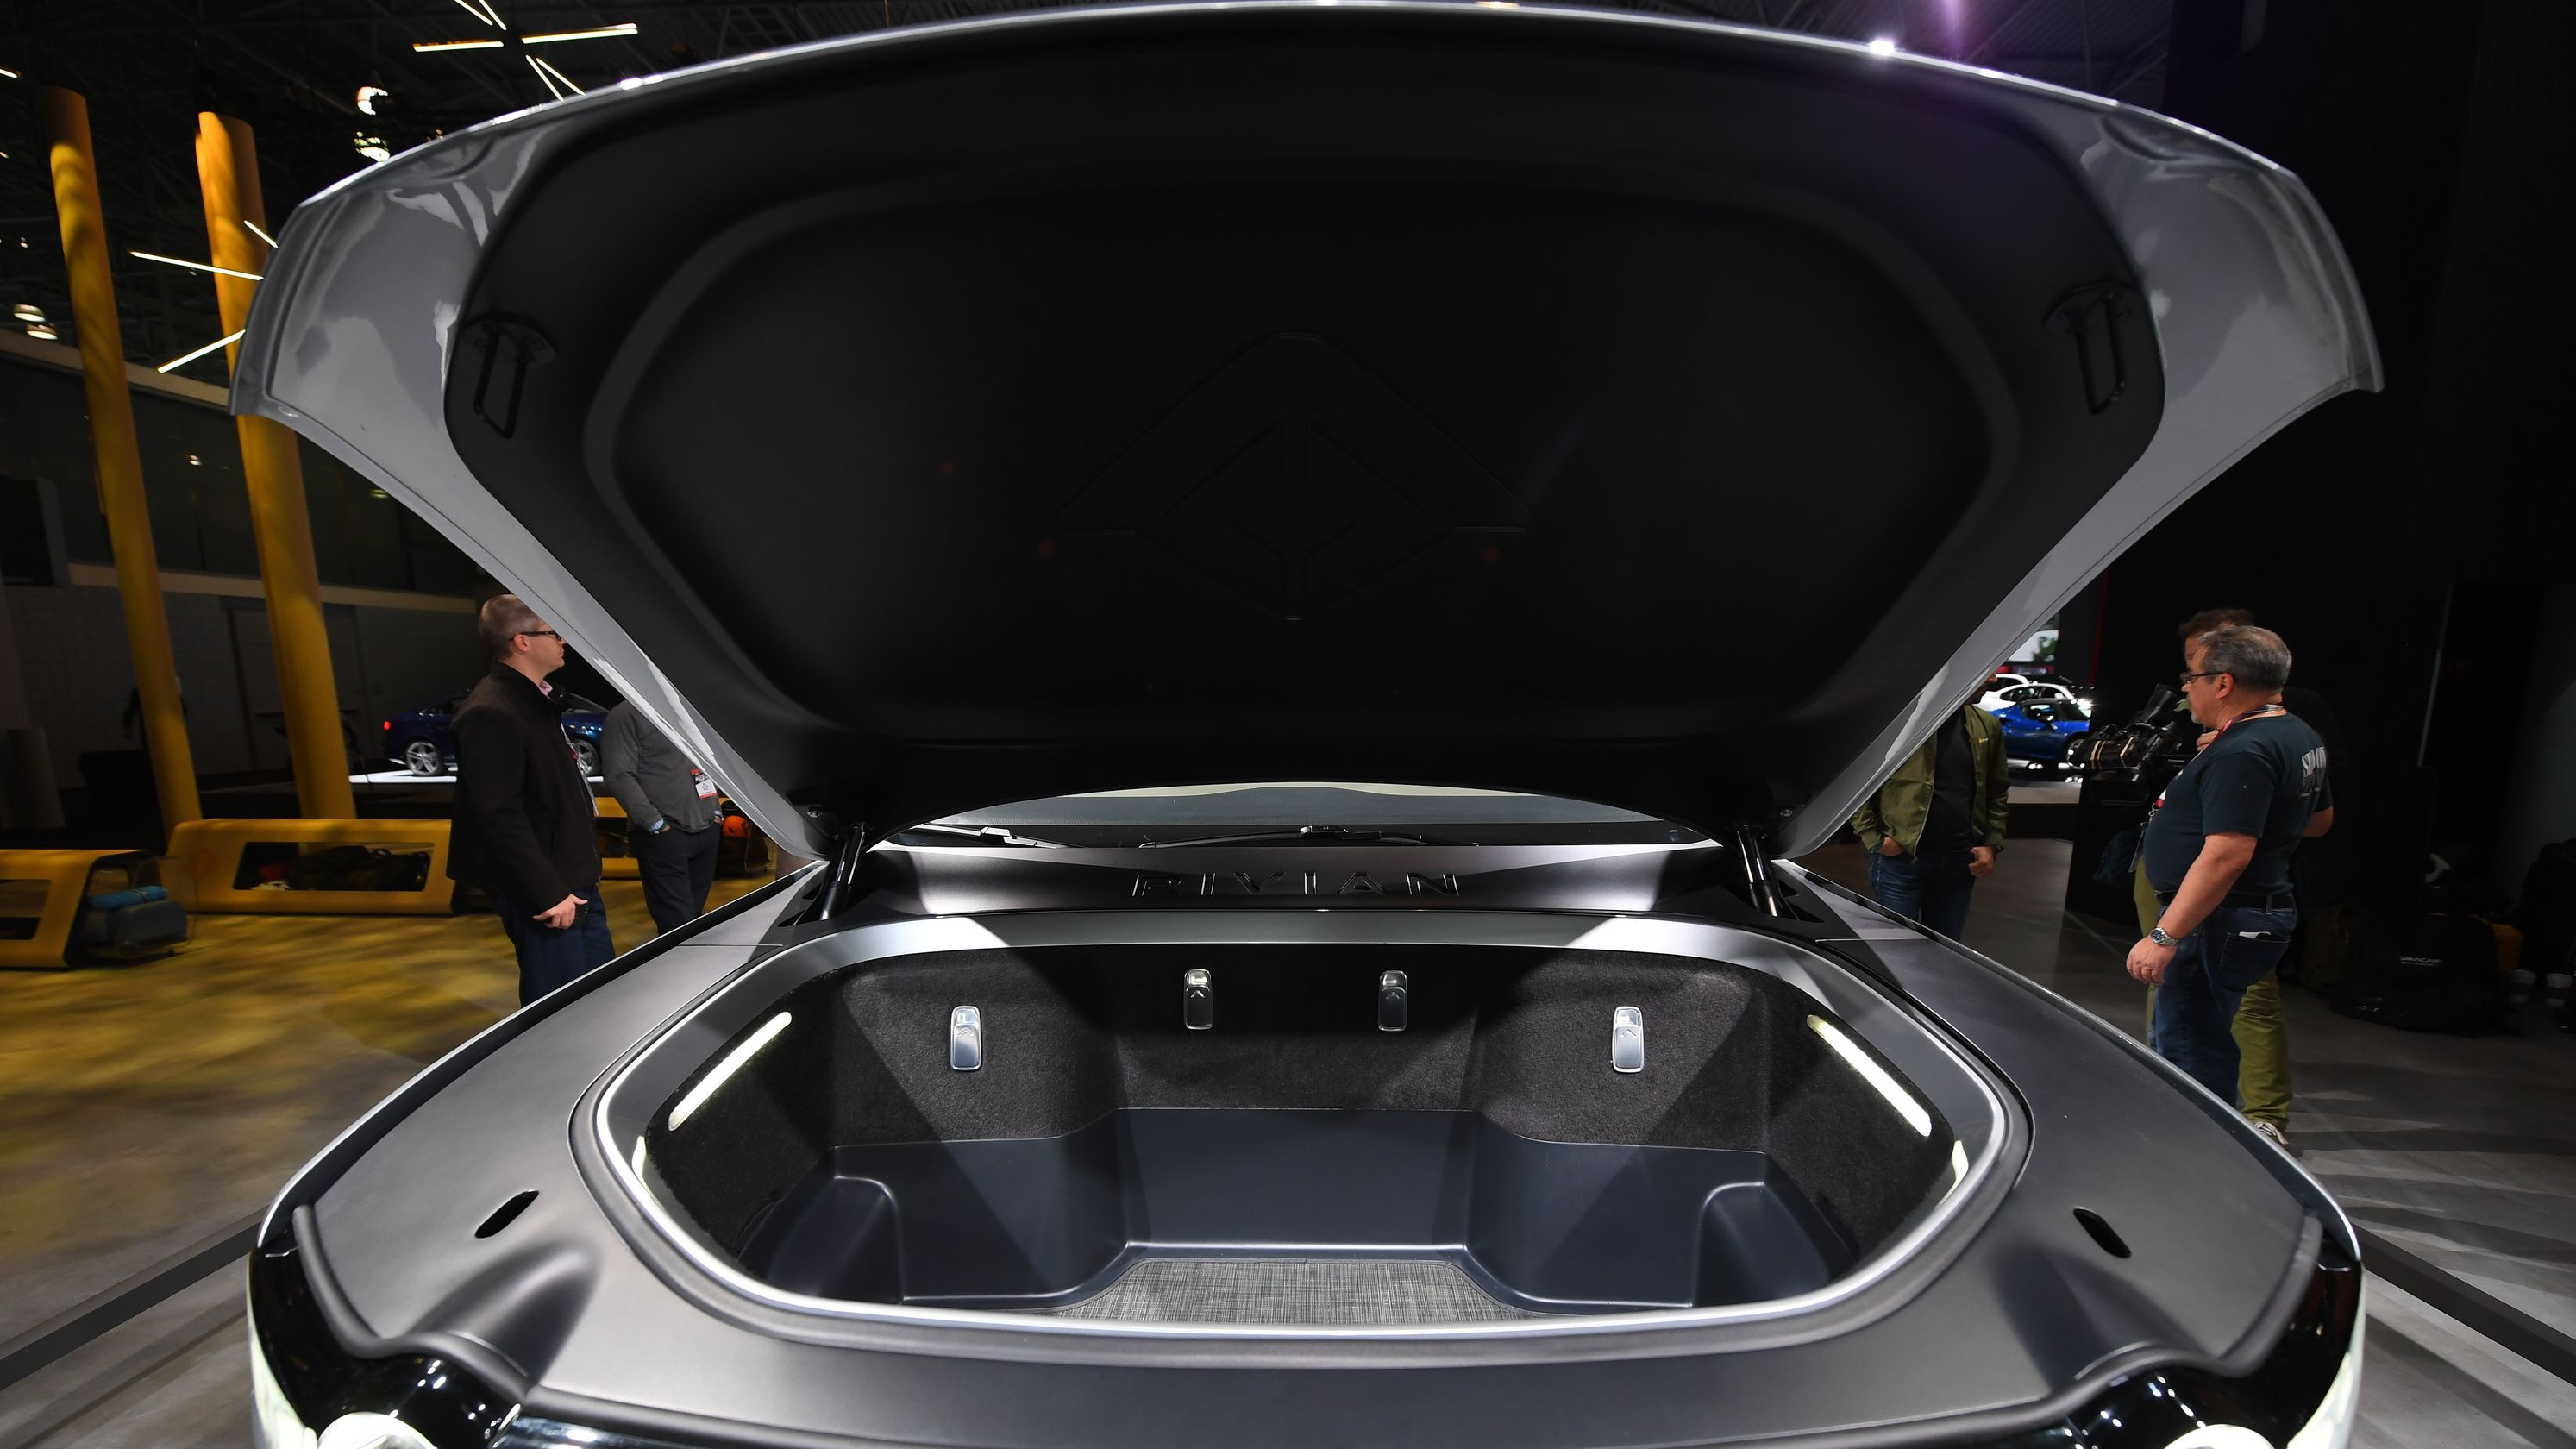 Electric Cars Like Rivian Jaguar Tesla Offer New Frunk Storage